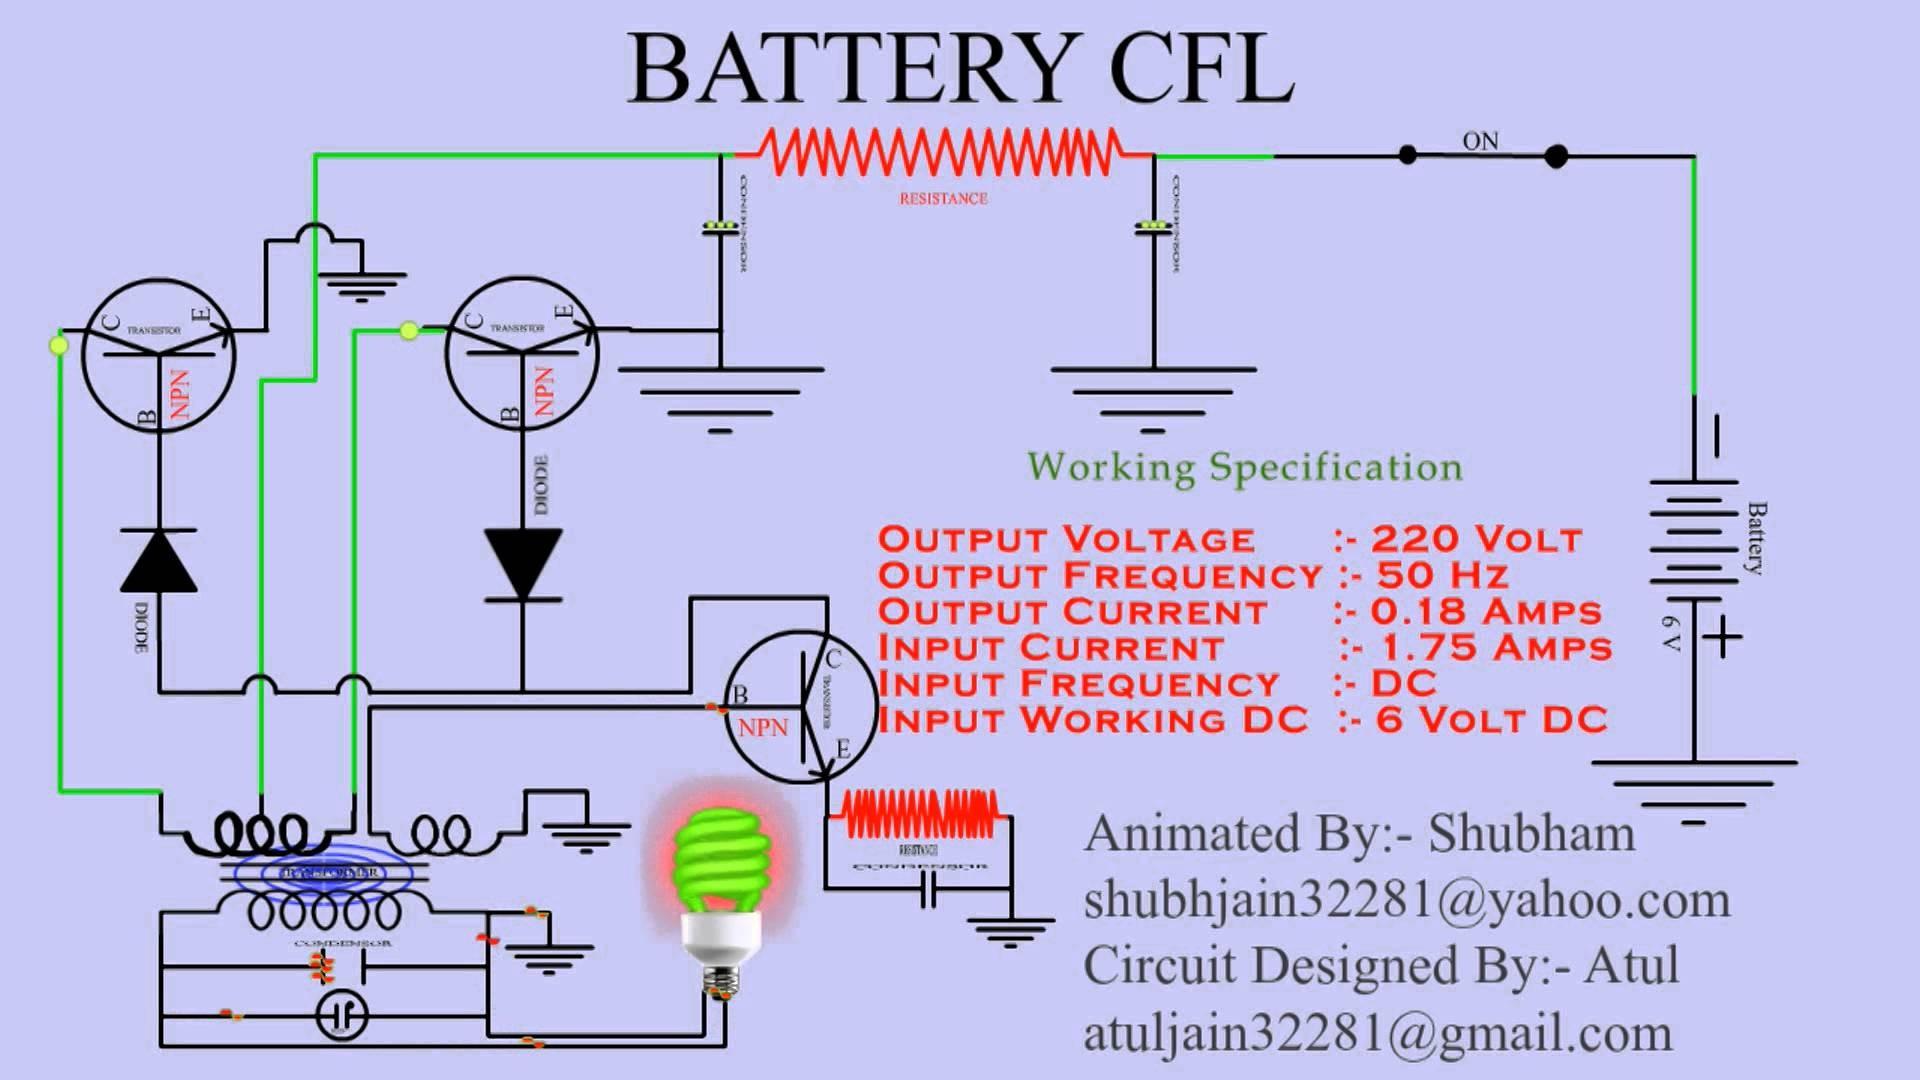 cfl 4 pin diagram wiring diagram \u0026 cable management cfl circuit output voltage cfl wiring diagram wiring diagram